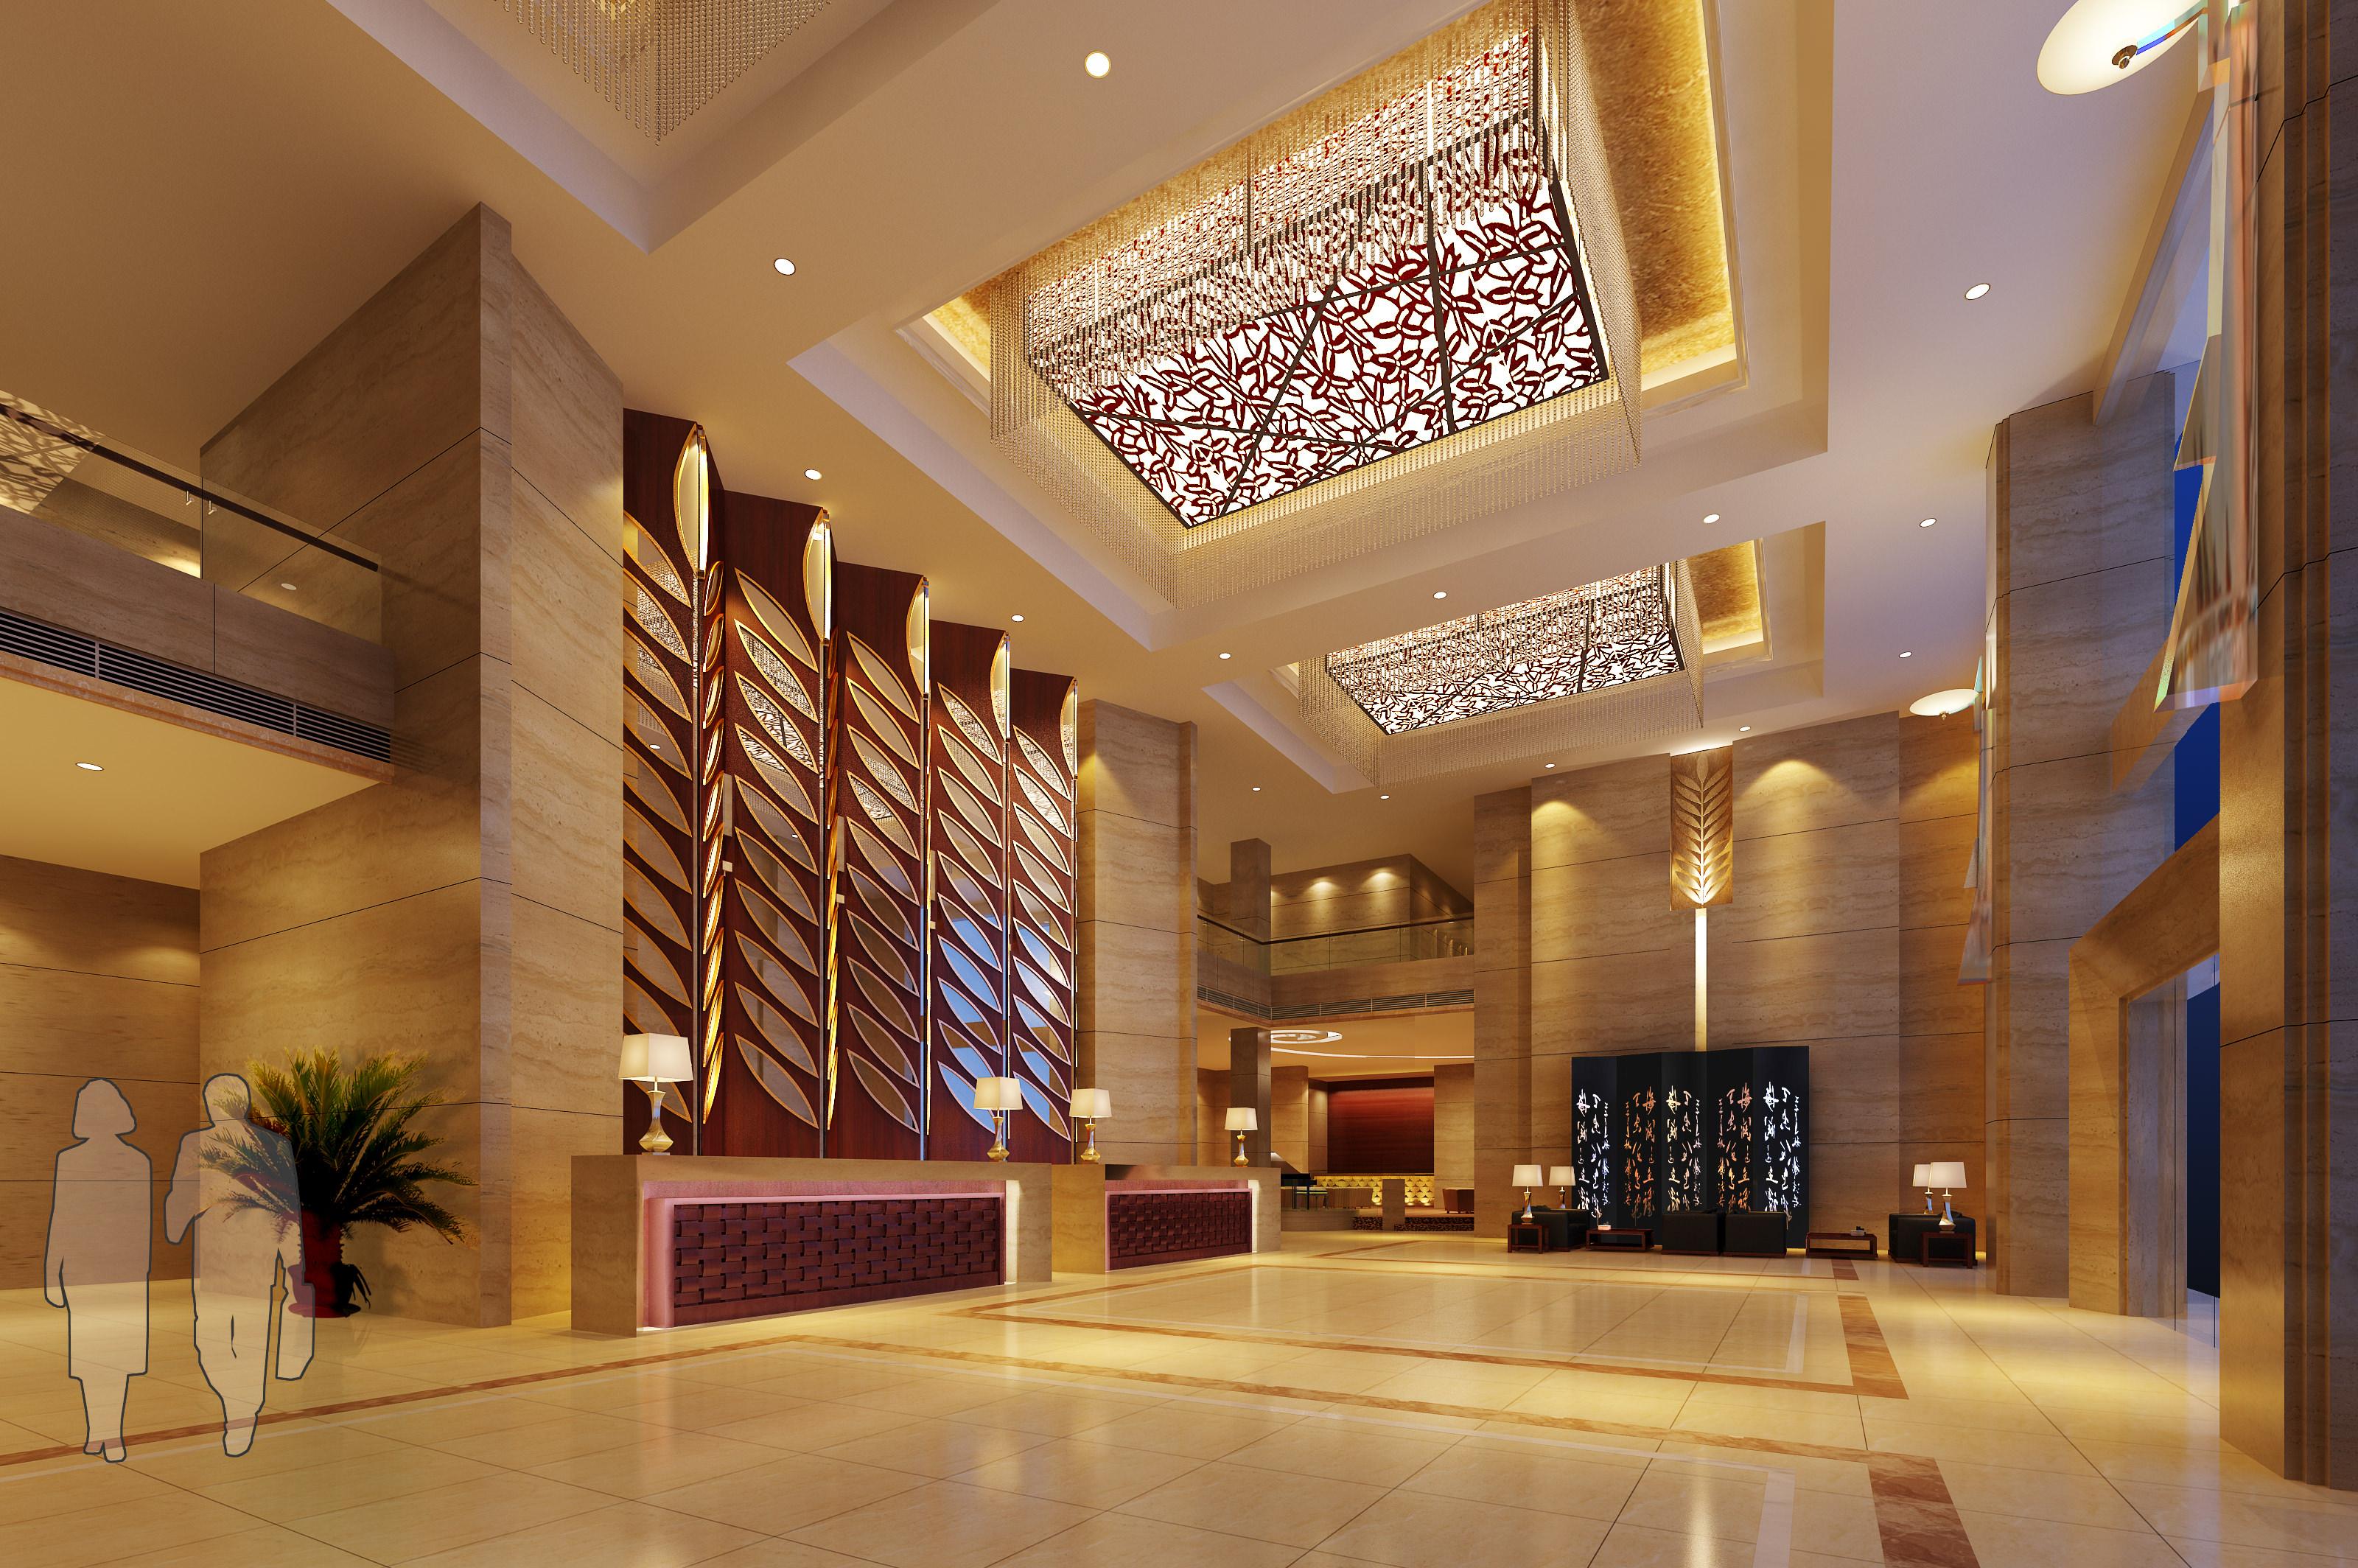 Luxury Lobby With Elegant Ceiling Decor 3d Model Max 1